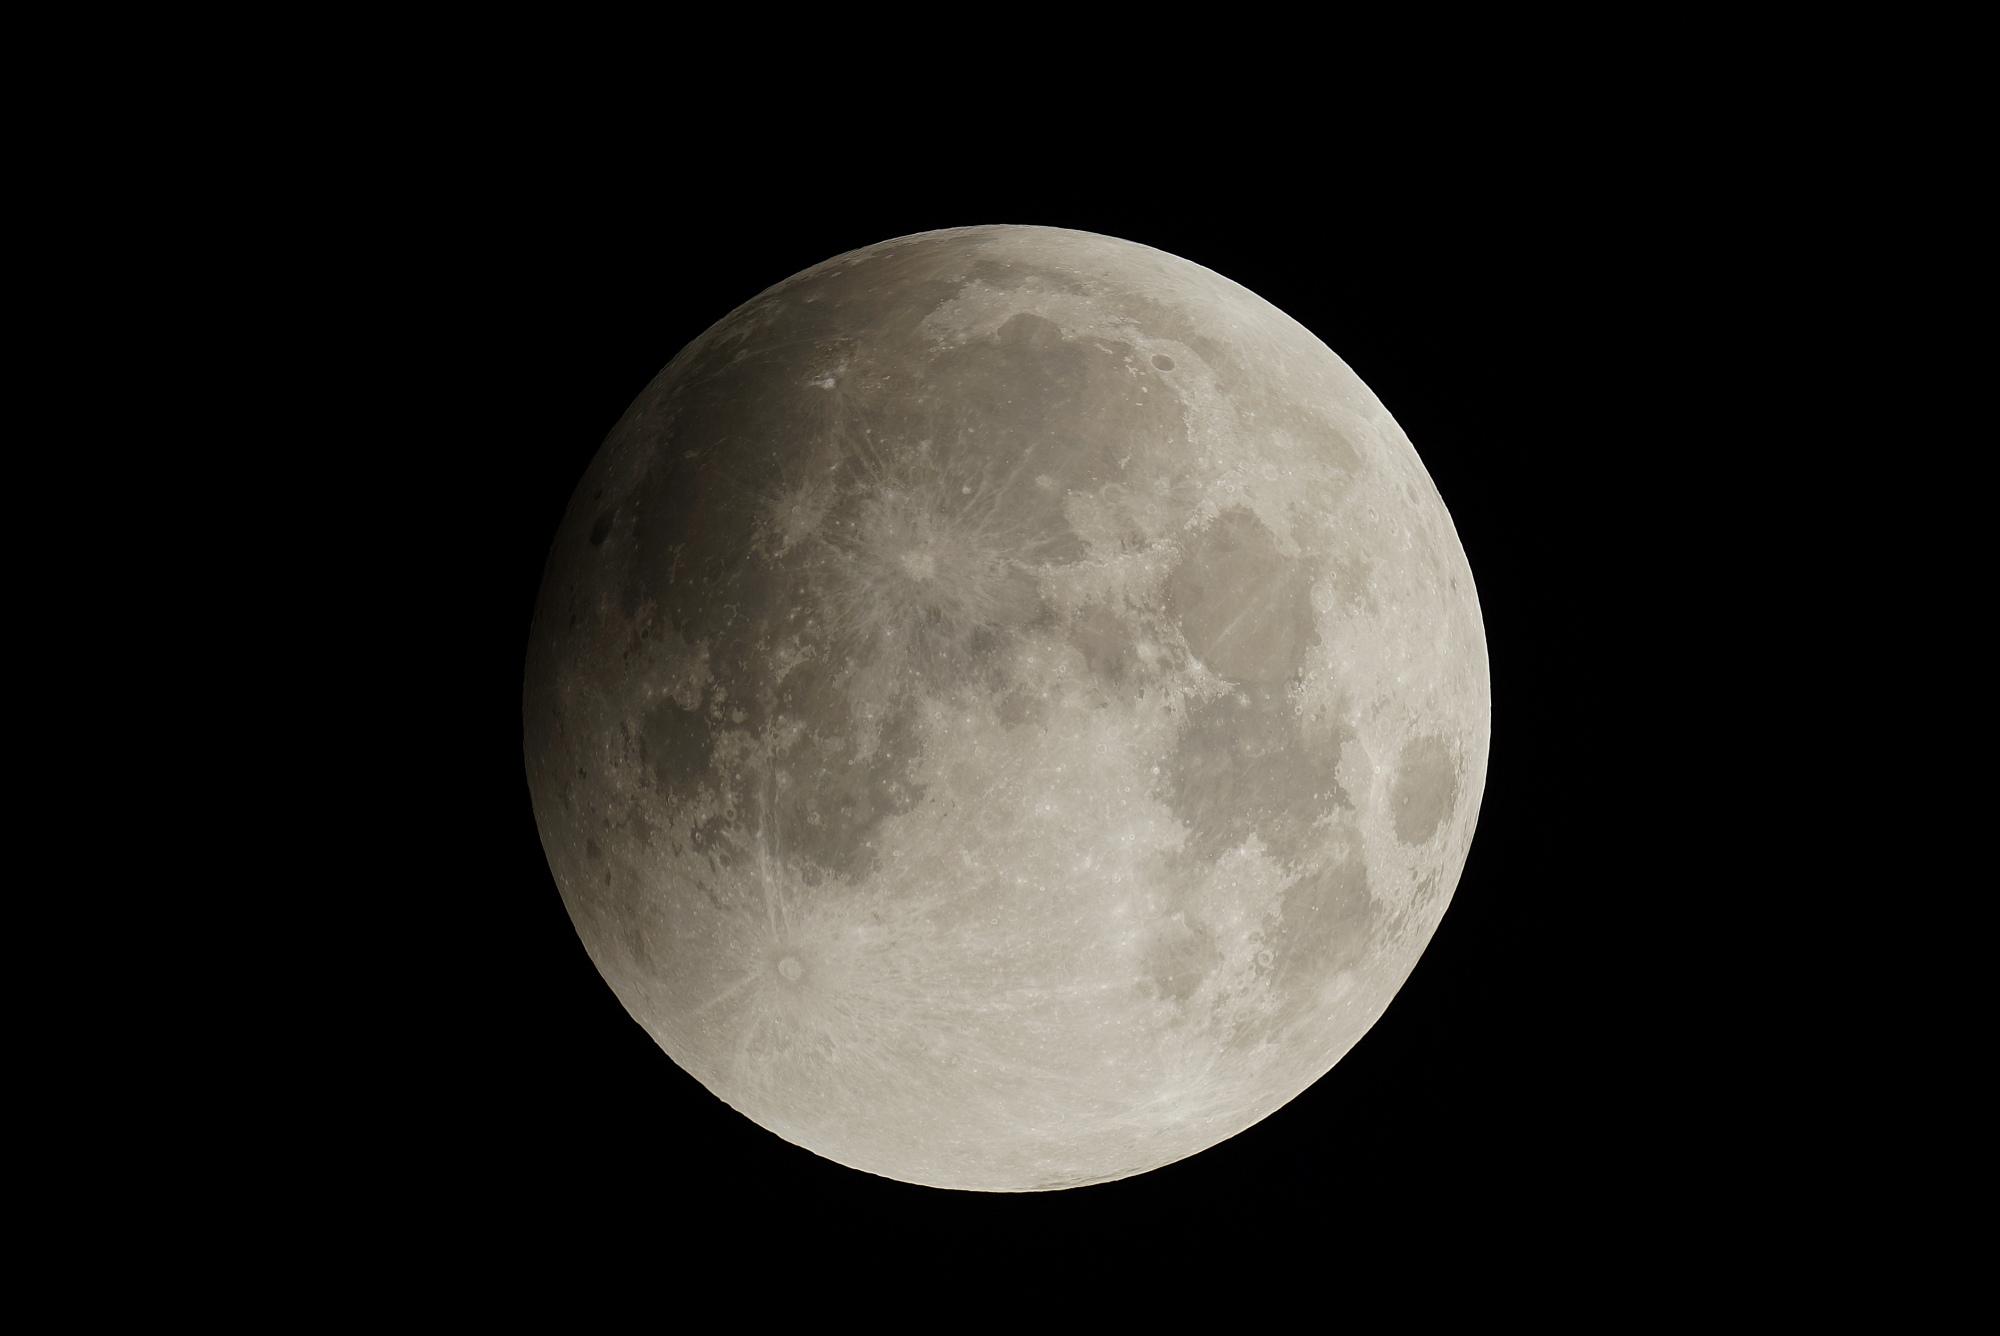 lune-210119-3h30m04-t407f4mf.thumb.jpg.c8ccef070a37312459df7e583b266e88.jpg